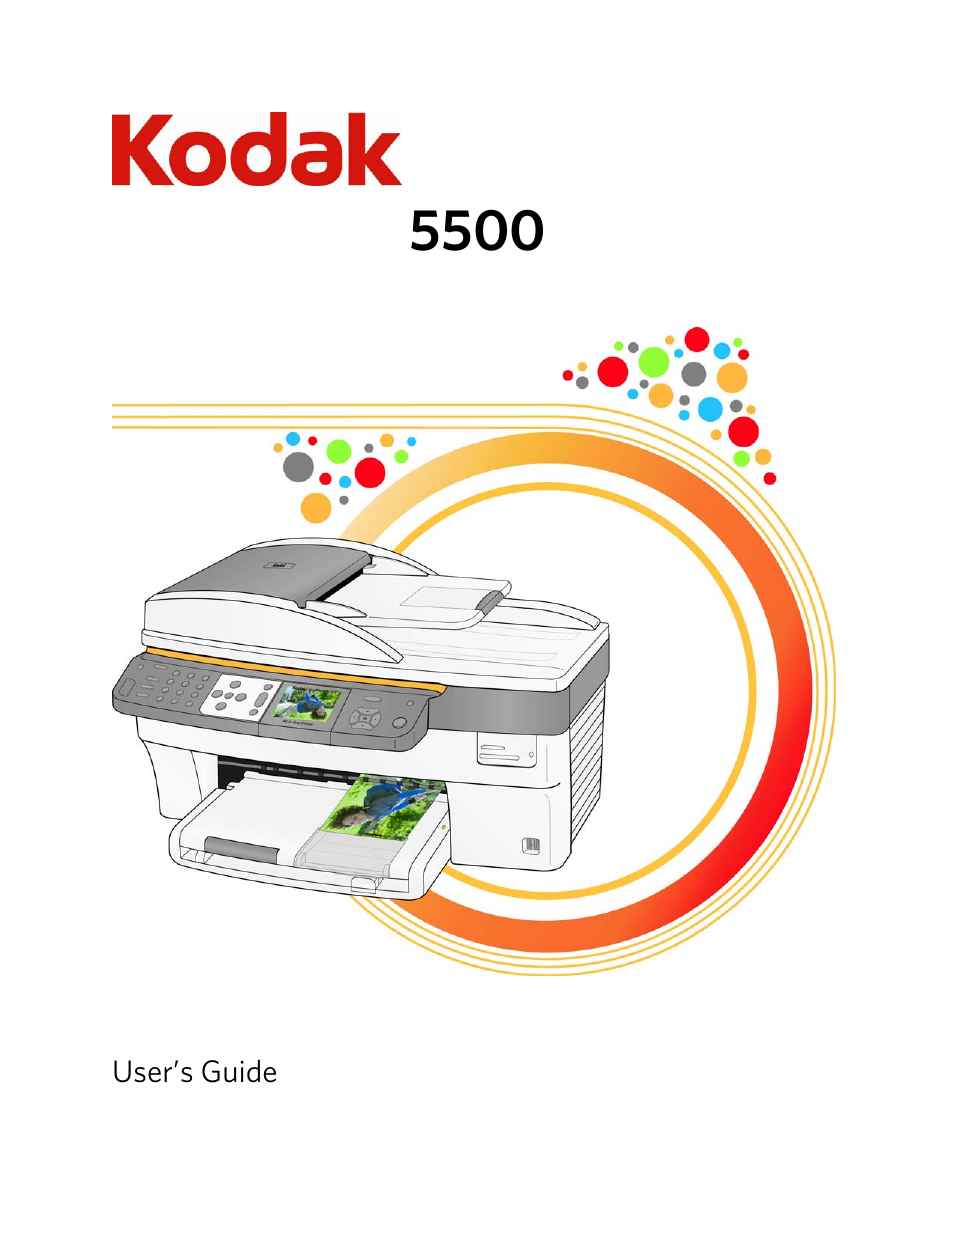 kodak easyshare 5500 user manual 122 pages rh manualsdir com Kodak EasyShare Z612 Manual Kodak EasyShare 5100 Printer Service Manual